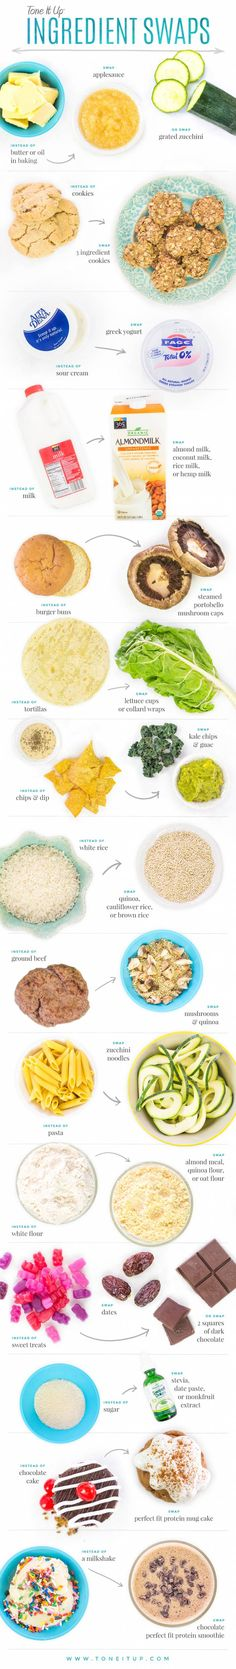 Tone-It-Up-Healthy-Ingredient-Swap